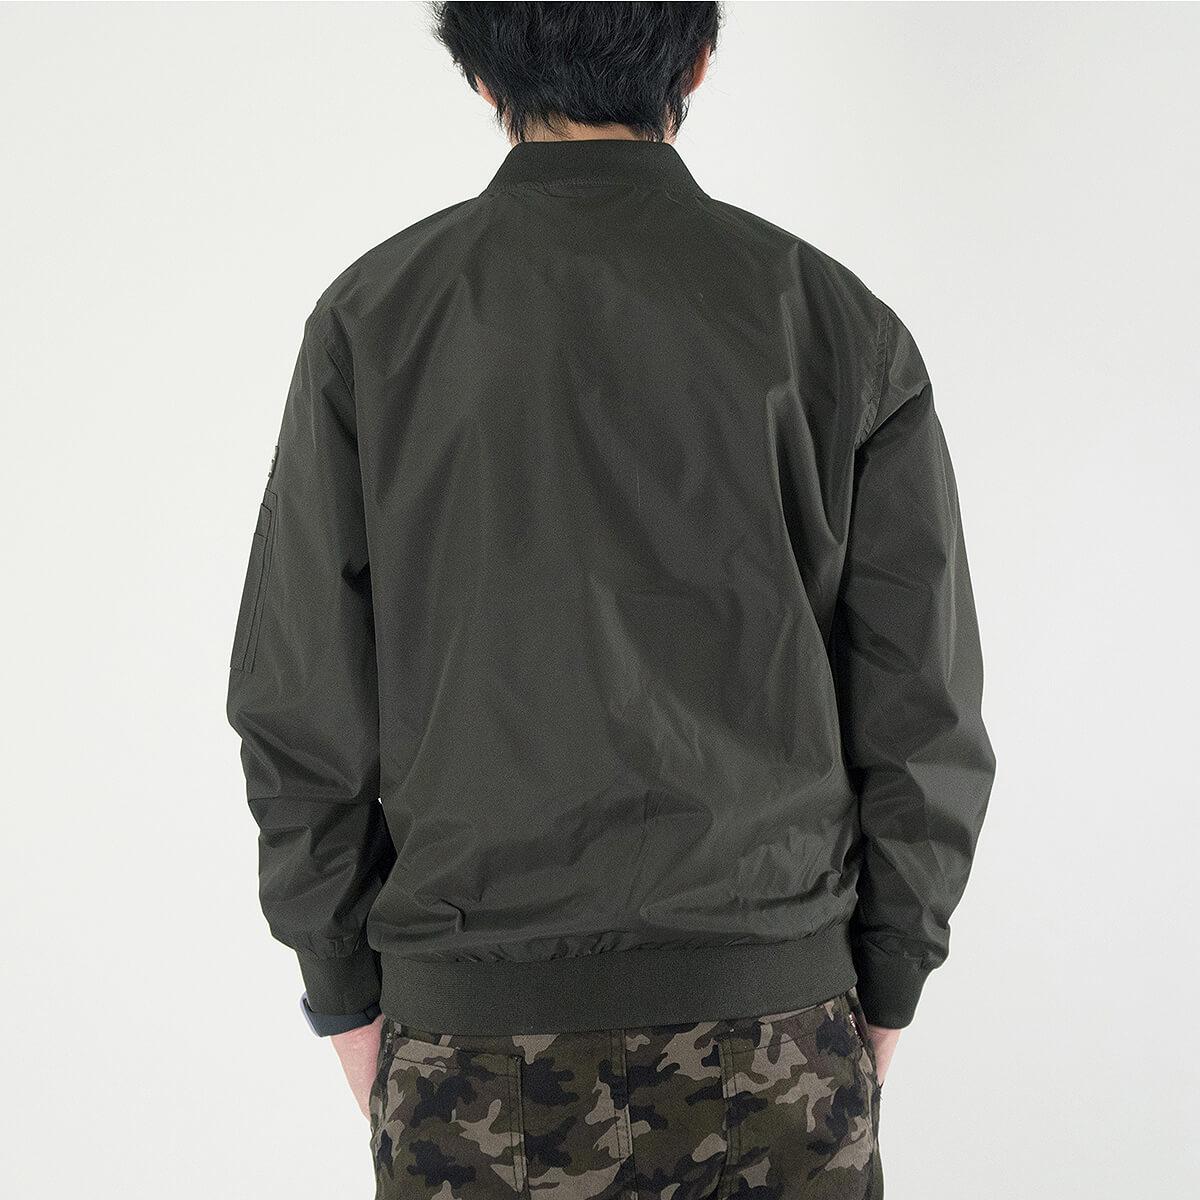 MA-1飛行外套 飛行夾克 空軍外套 防風外套 潮流時尚休閒外套 立領外套 黑色外套 MA-1 Flight Jacket Men's Jackets Casual Jackets (321-889-01)軍綠色、(321-889-02)黑色 M L XL (胸圍114~124公分  45~49英吋) 男 [實體店面保障] sun-e 7